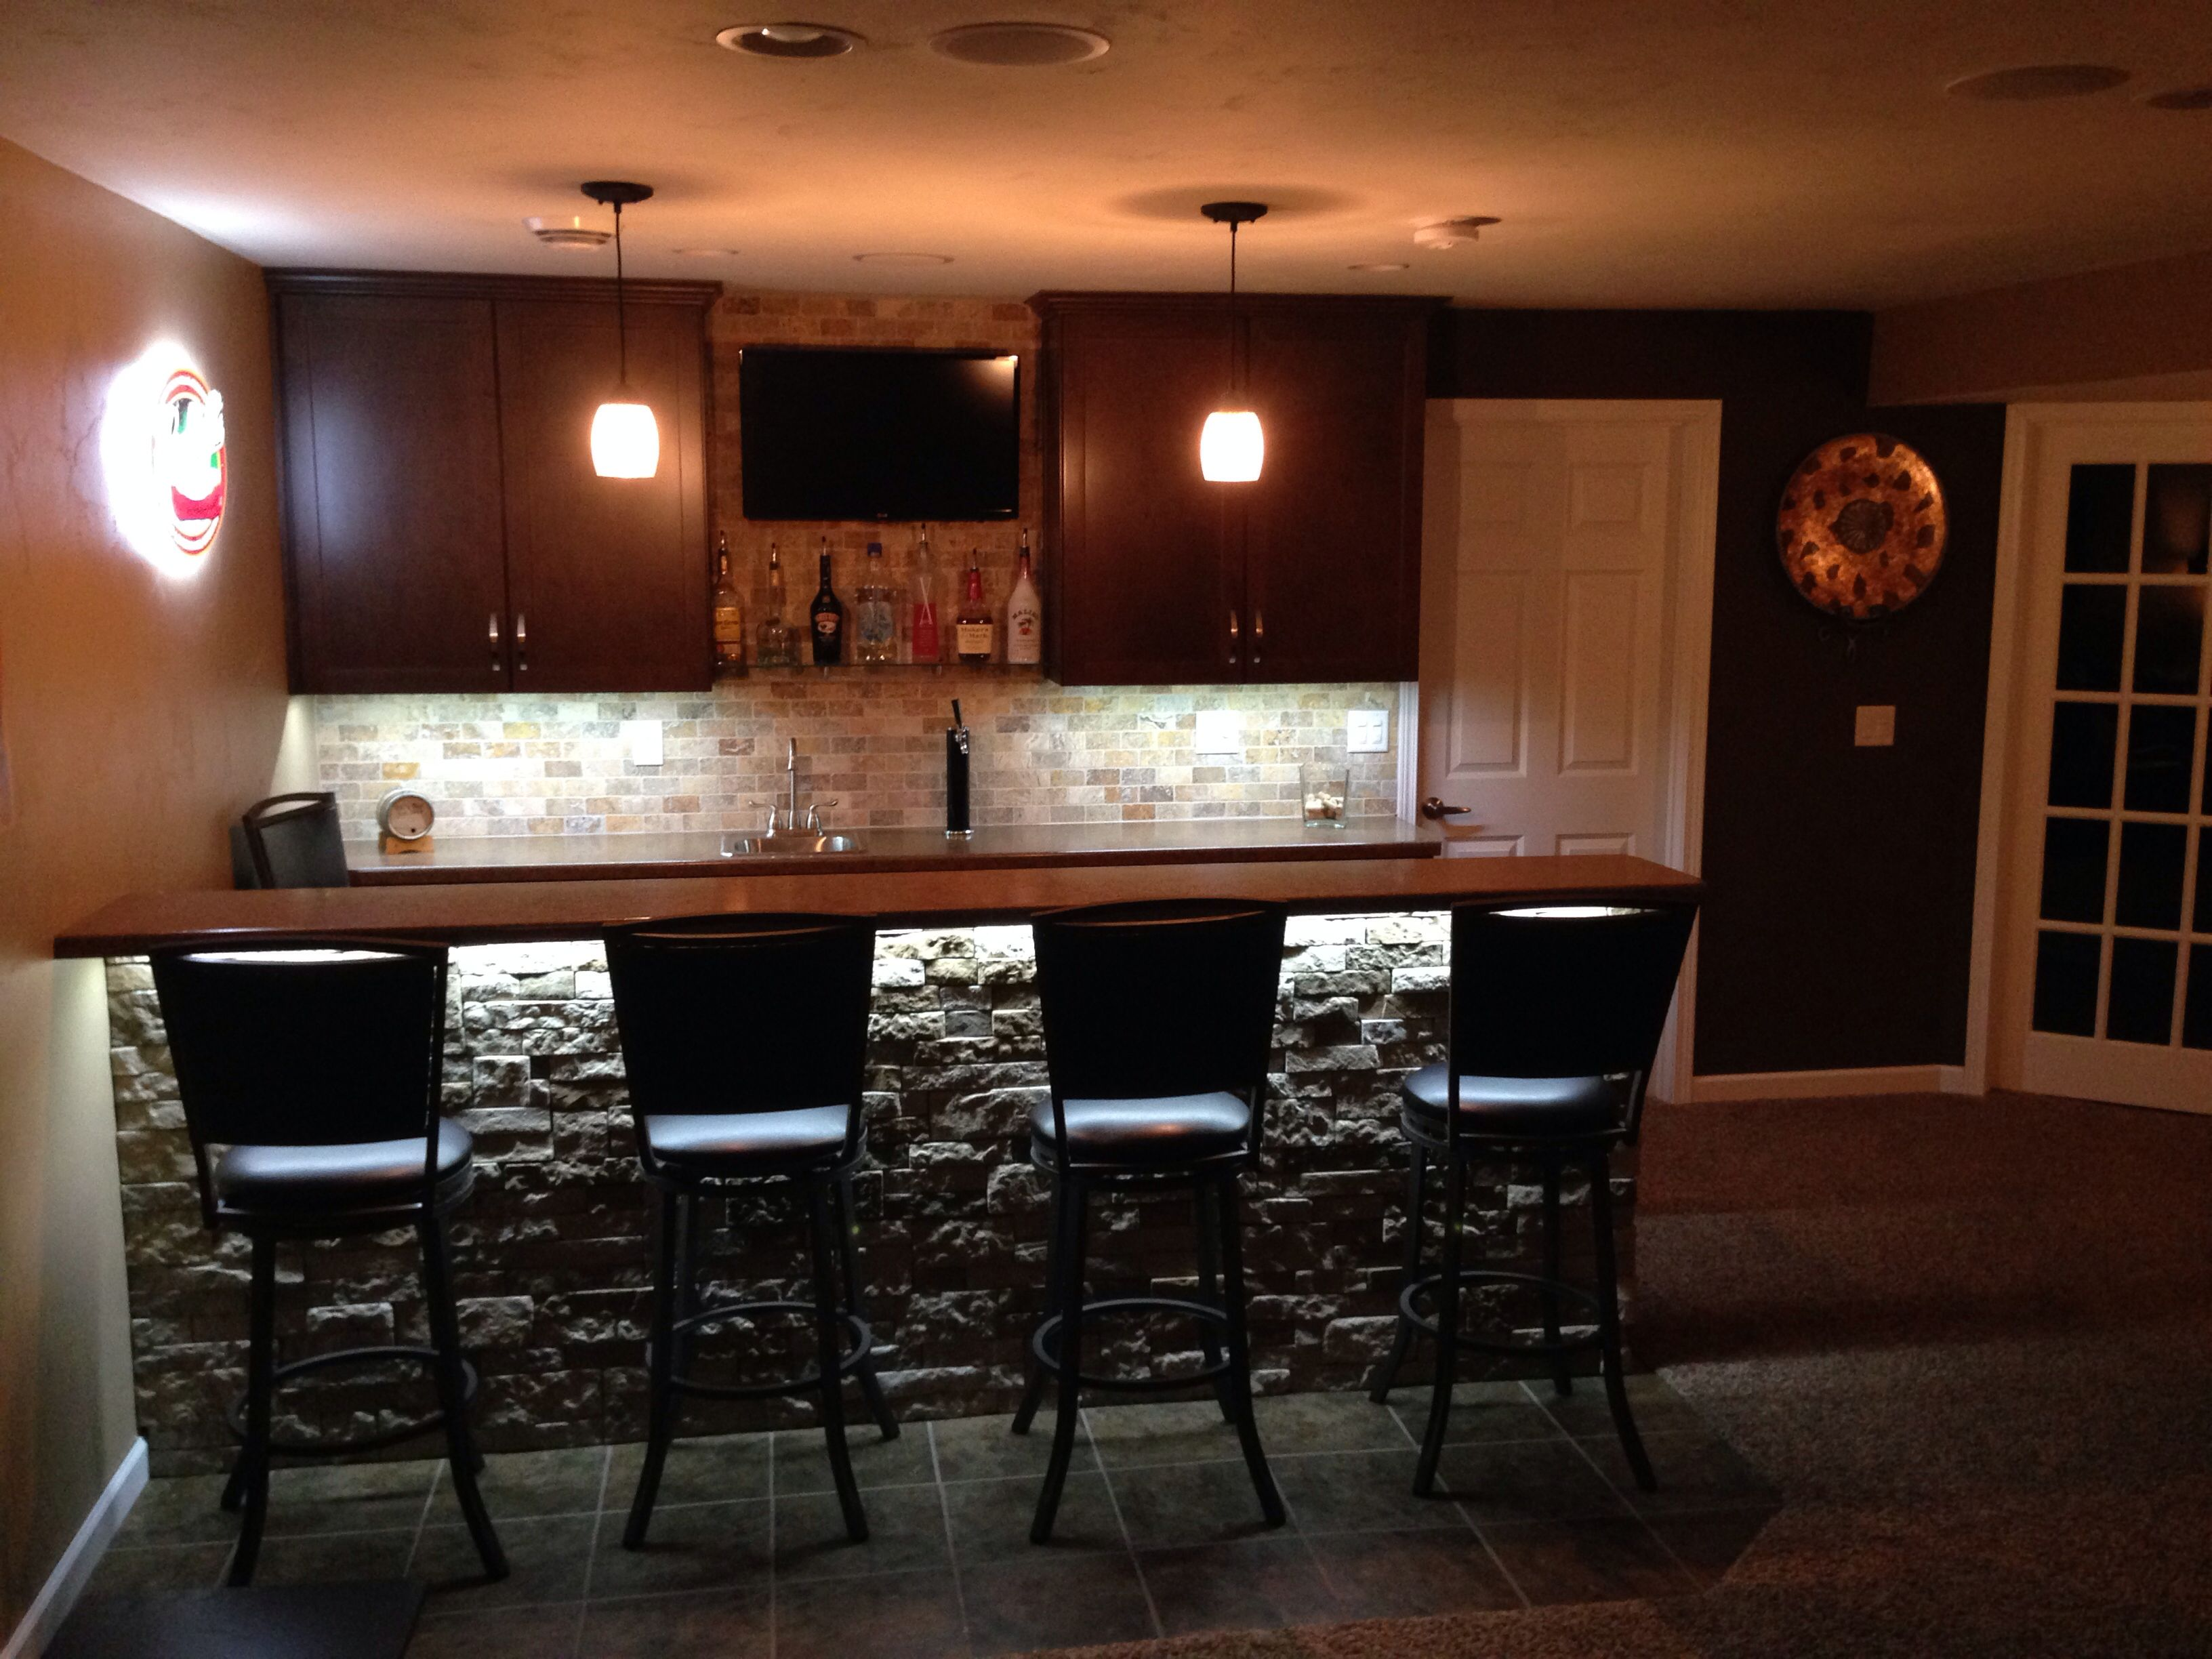 Basement Bar Love The Under Bar Lighting Bar Lighting Basement Bar Basement Bar Designs